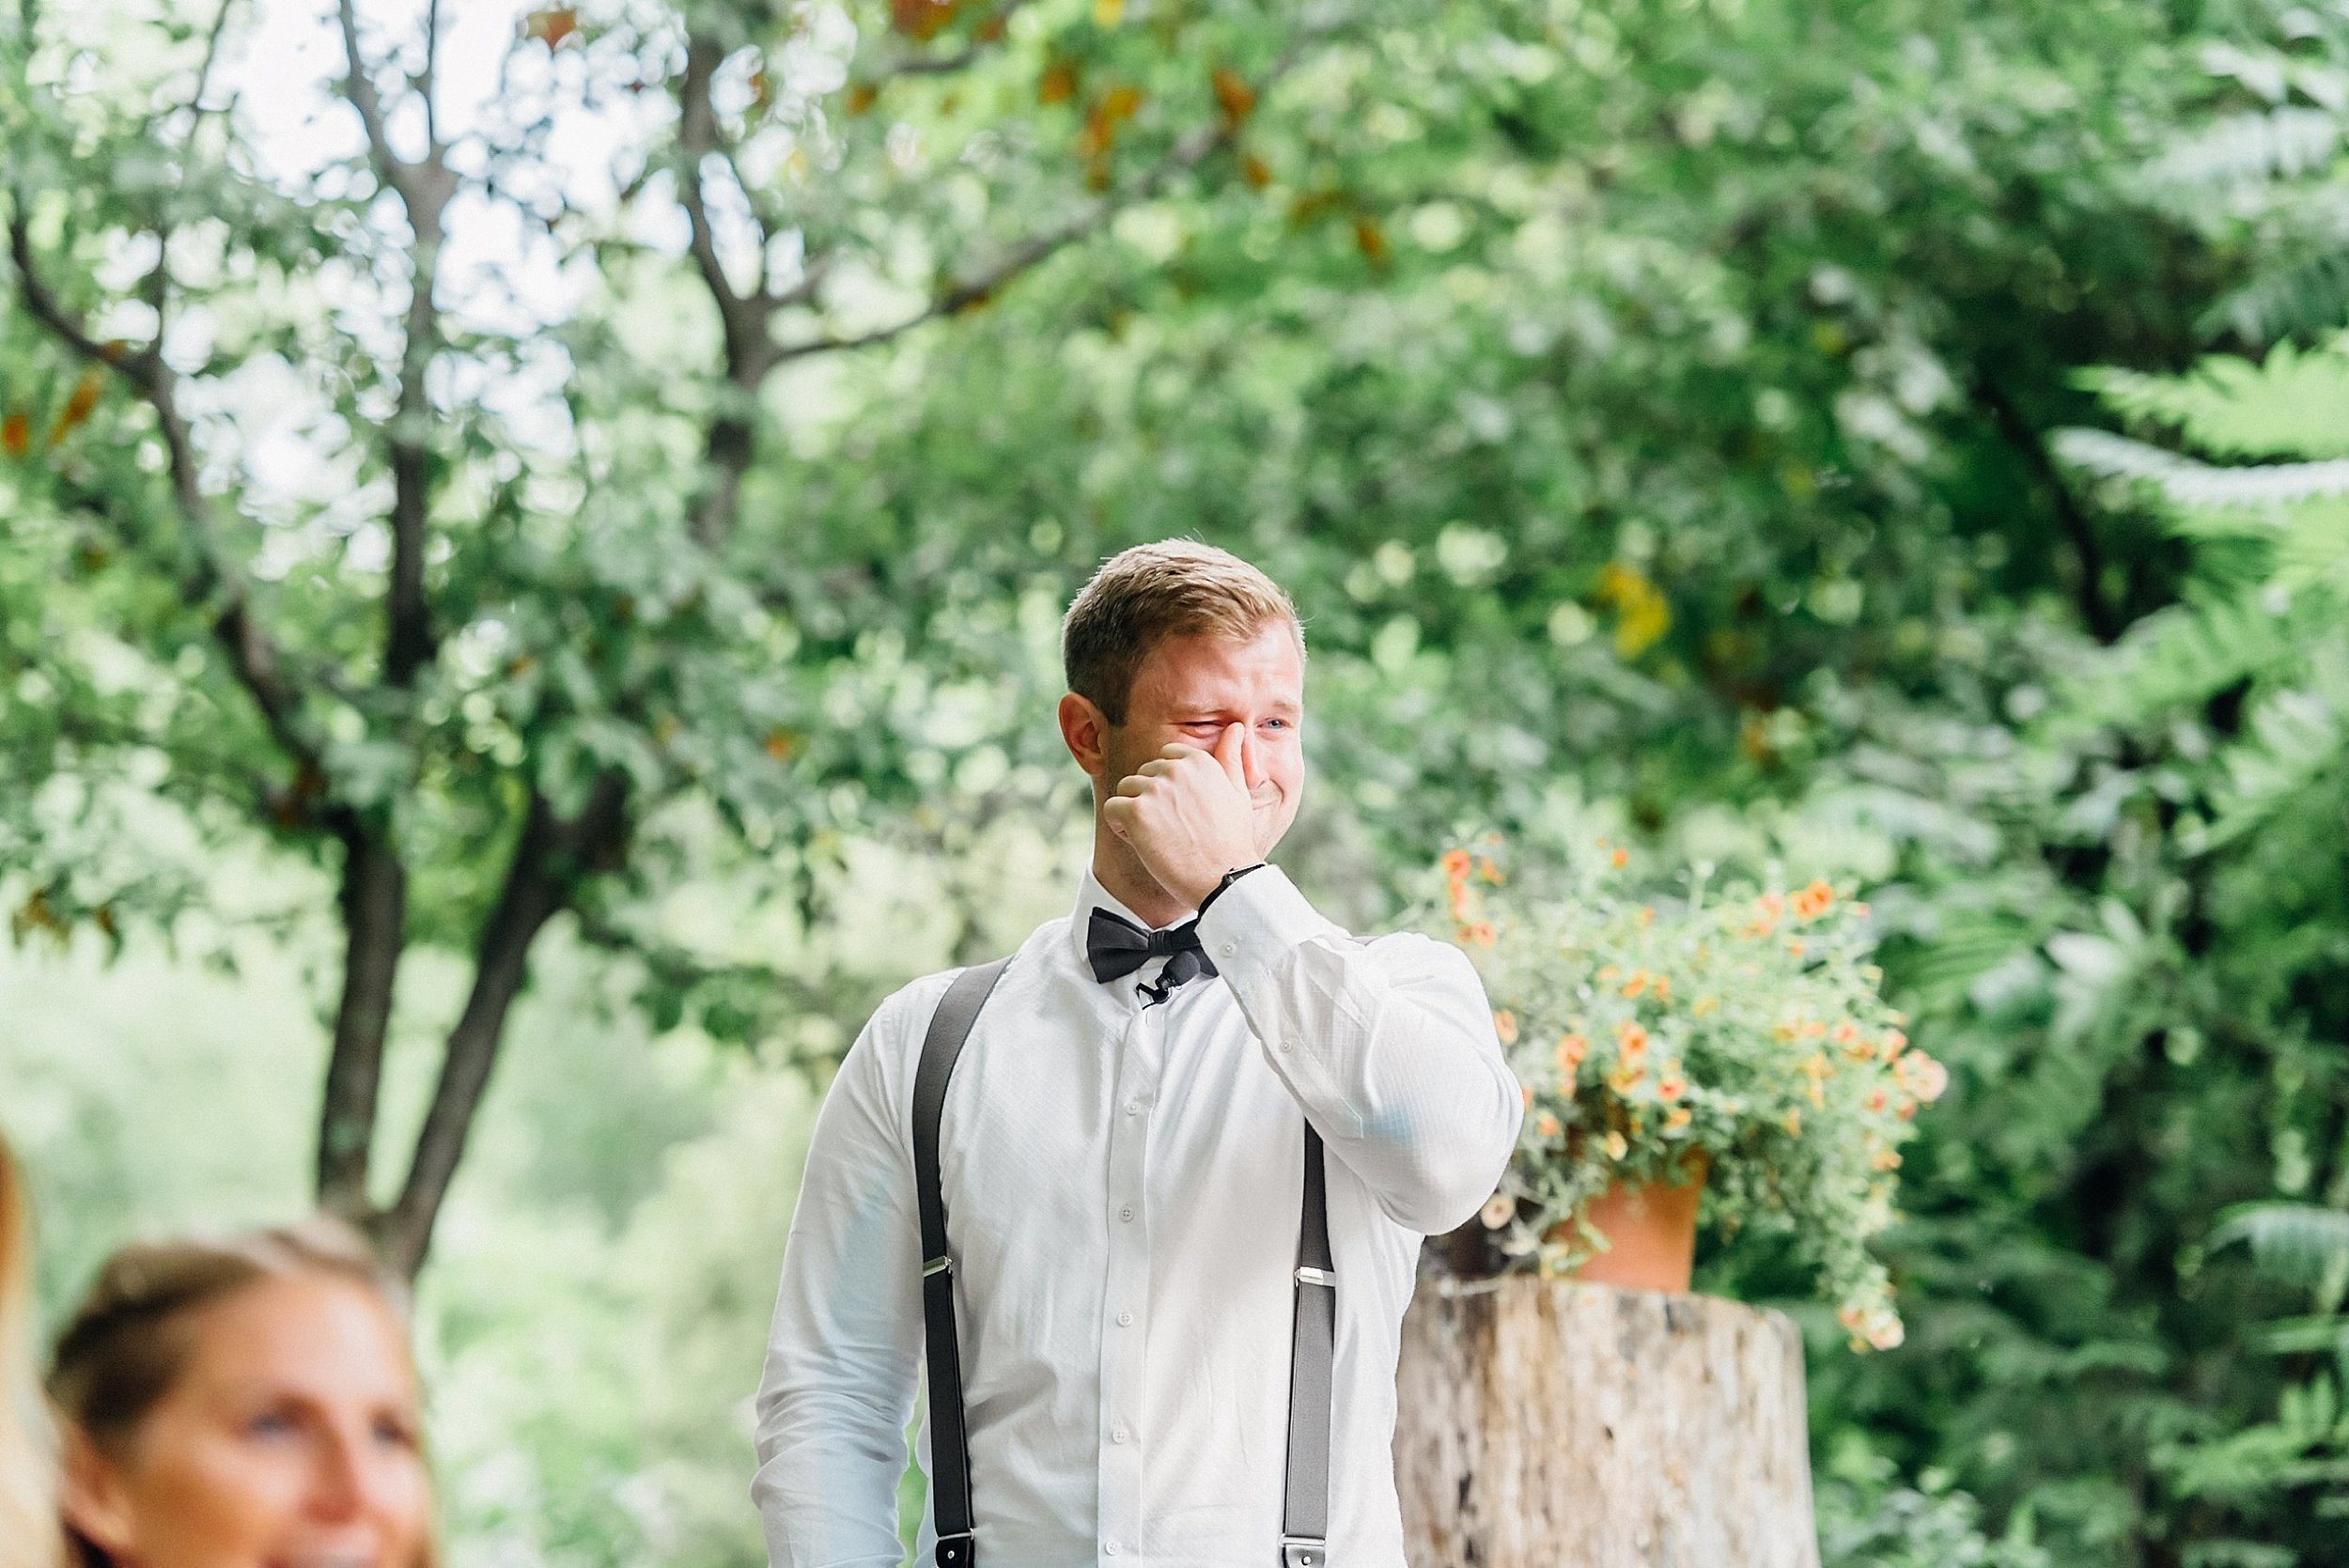 Ottawa Wedding Photographer - Stanley's Olde Maple Lane Barn Wedding - Ali & Batoul Photography_0027.jpg